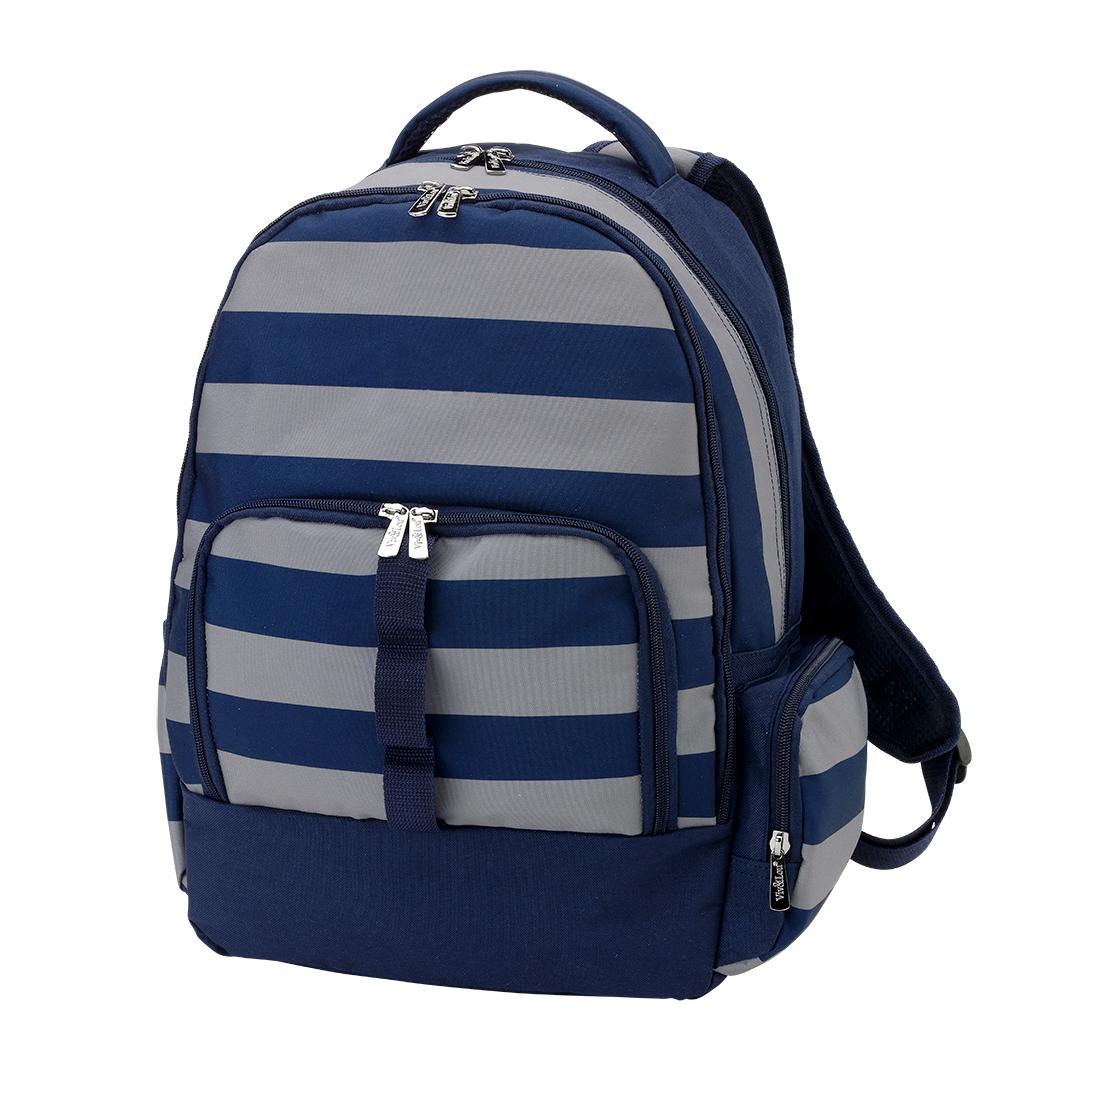 ccb415e2fbbe Blue And White Chevron Backpack- Fenix Toulouse Handball